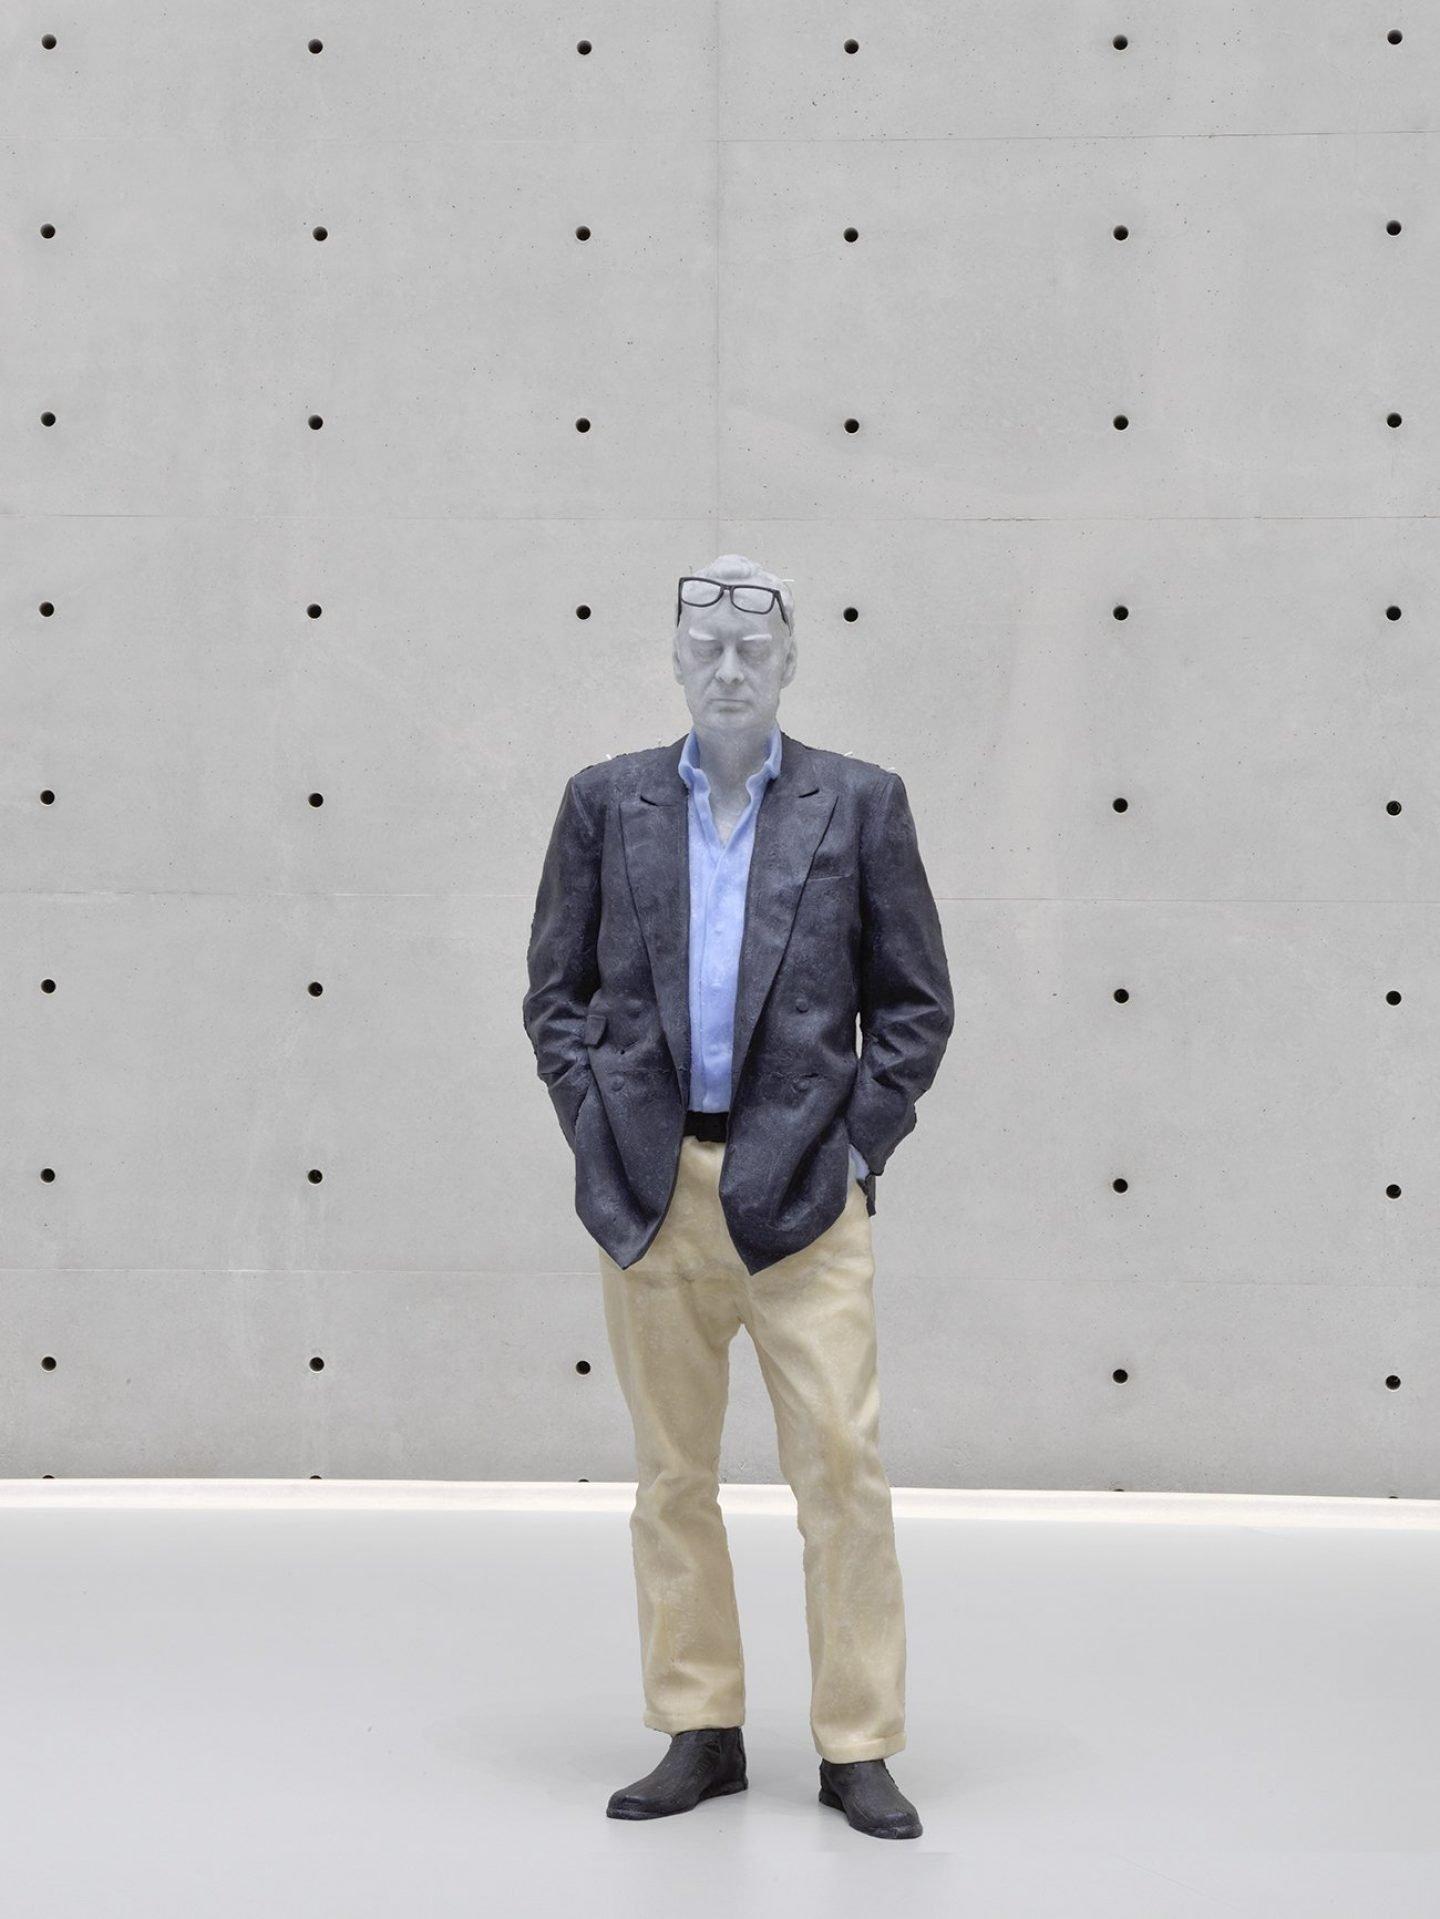 IGNANT-Art-Urs-Fischer-Pinault-Collection-03